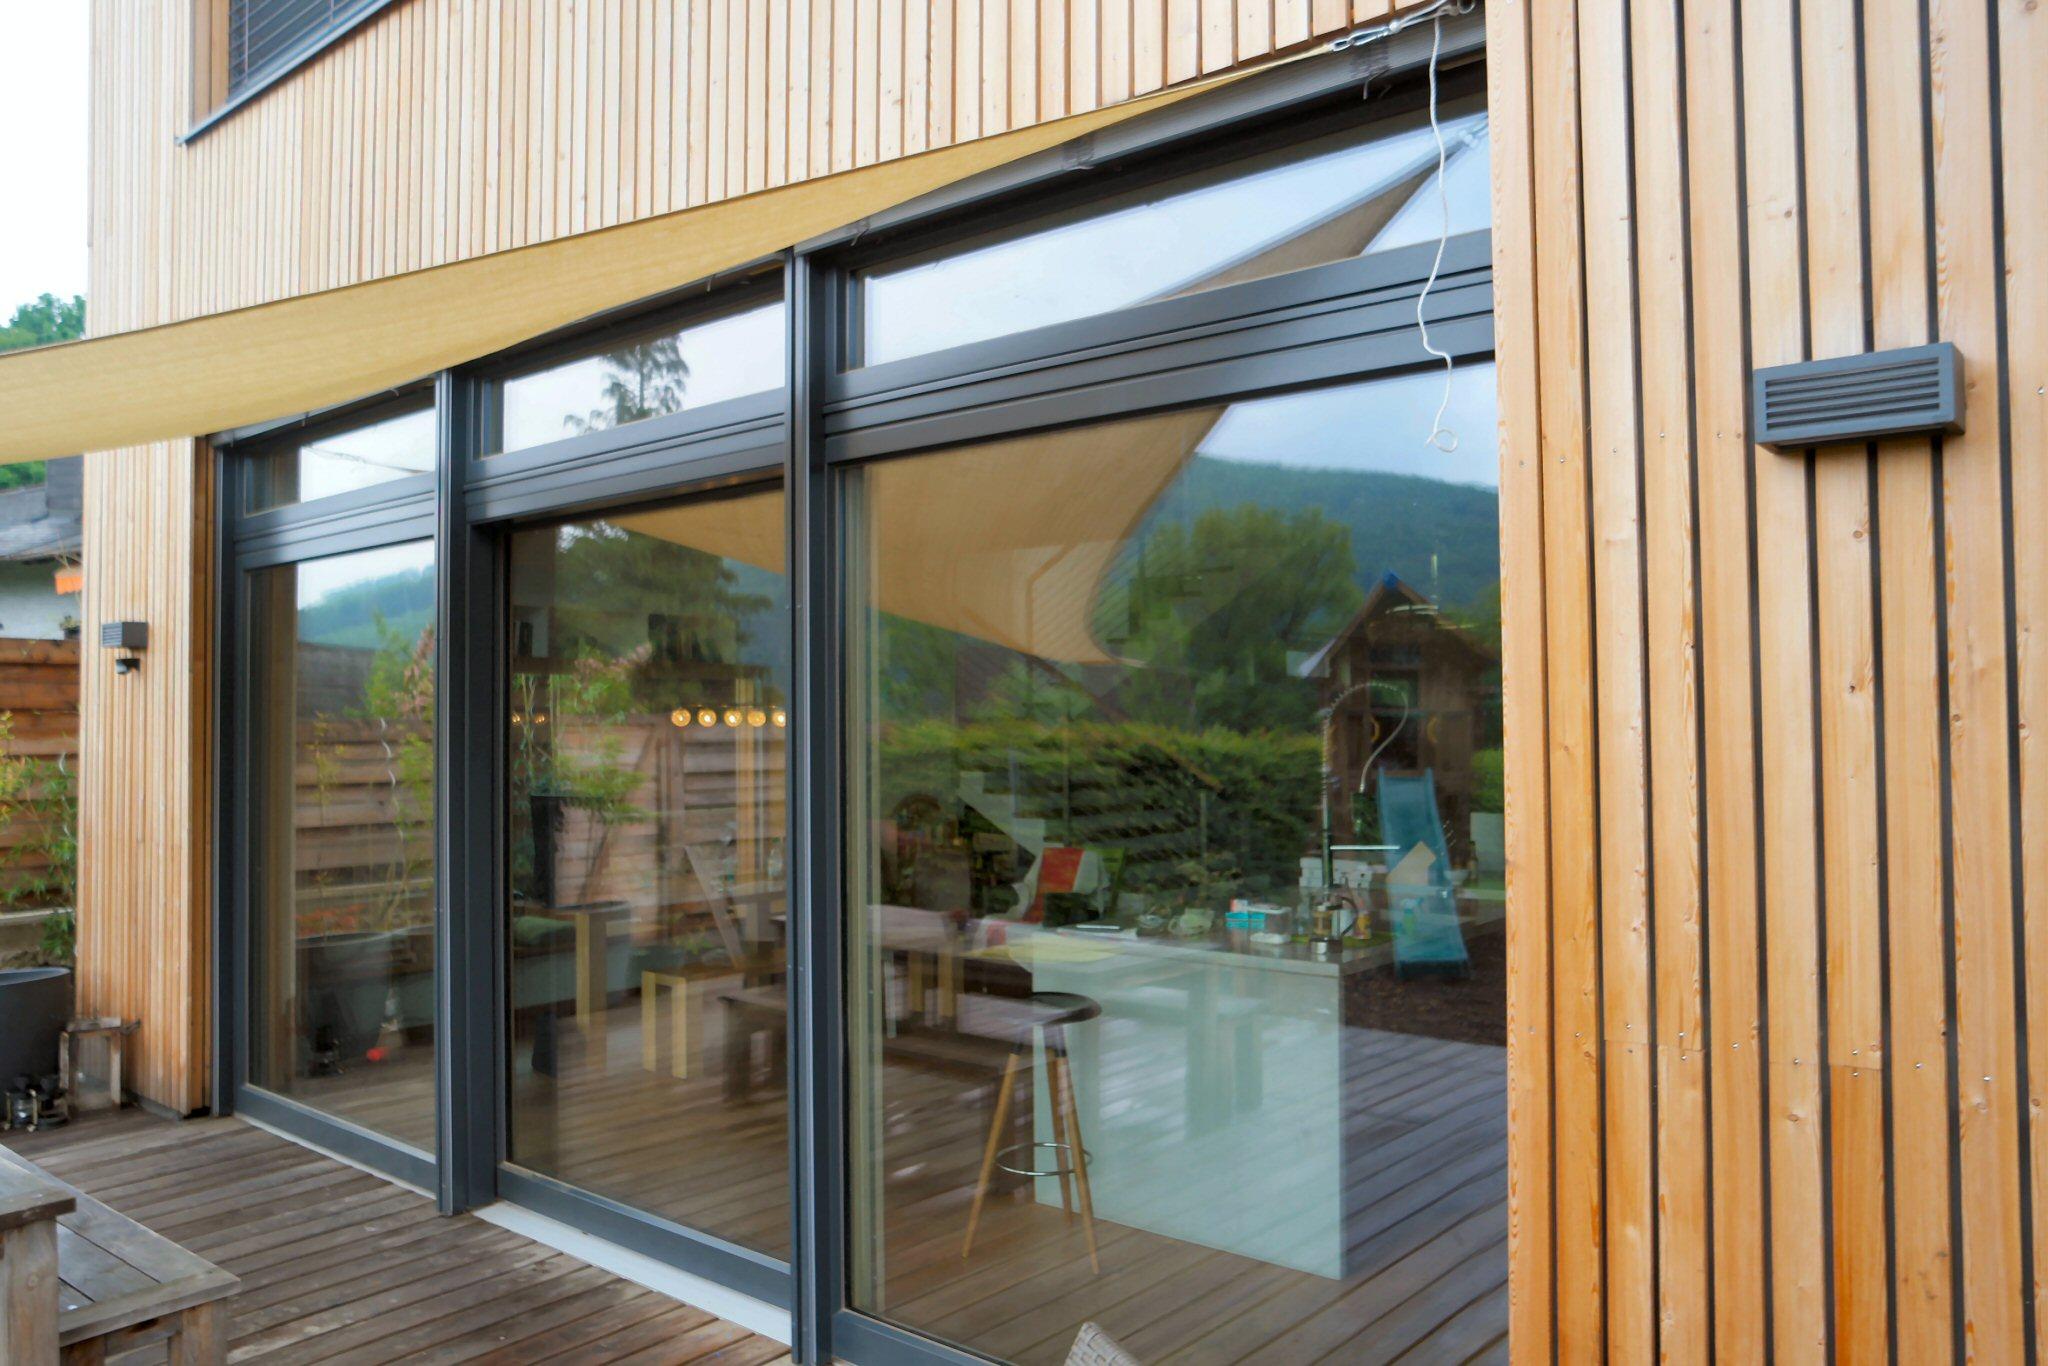 Aluminium windows and doors abacus windows and conservatories - Fenetre baie window ...